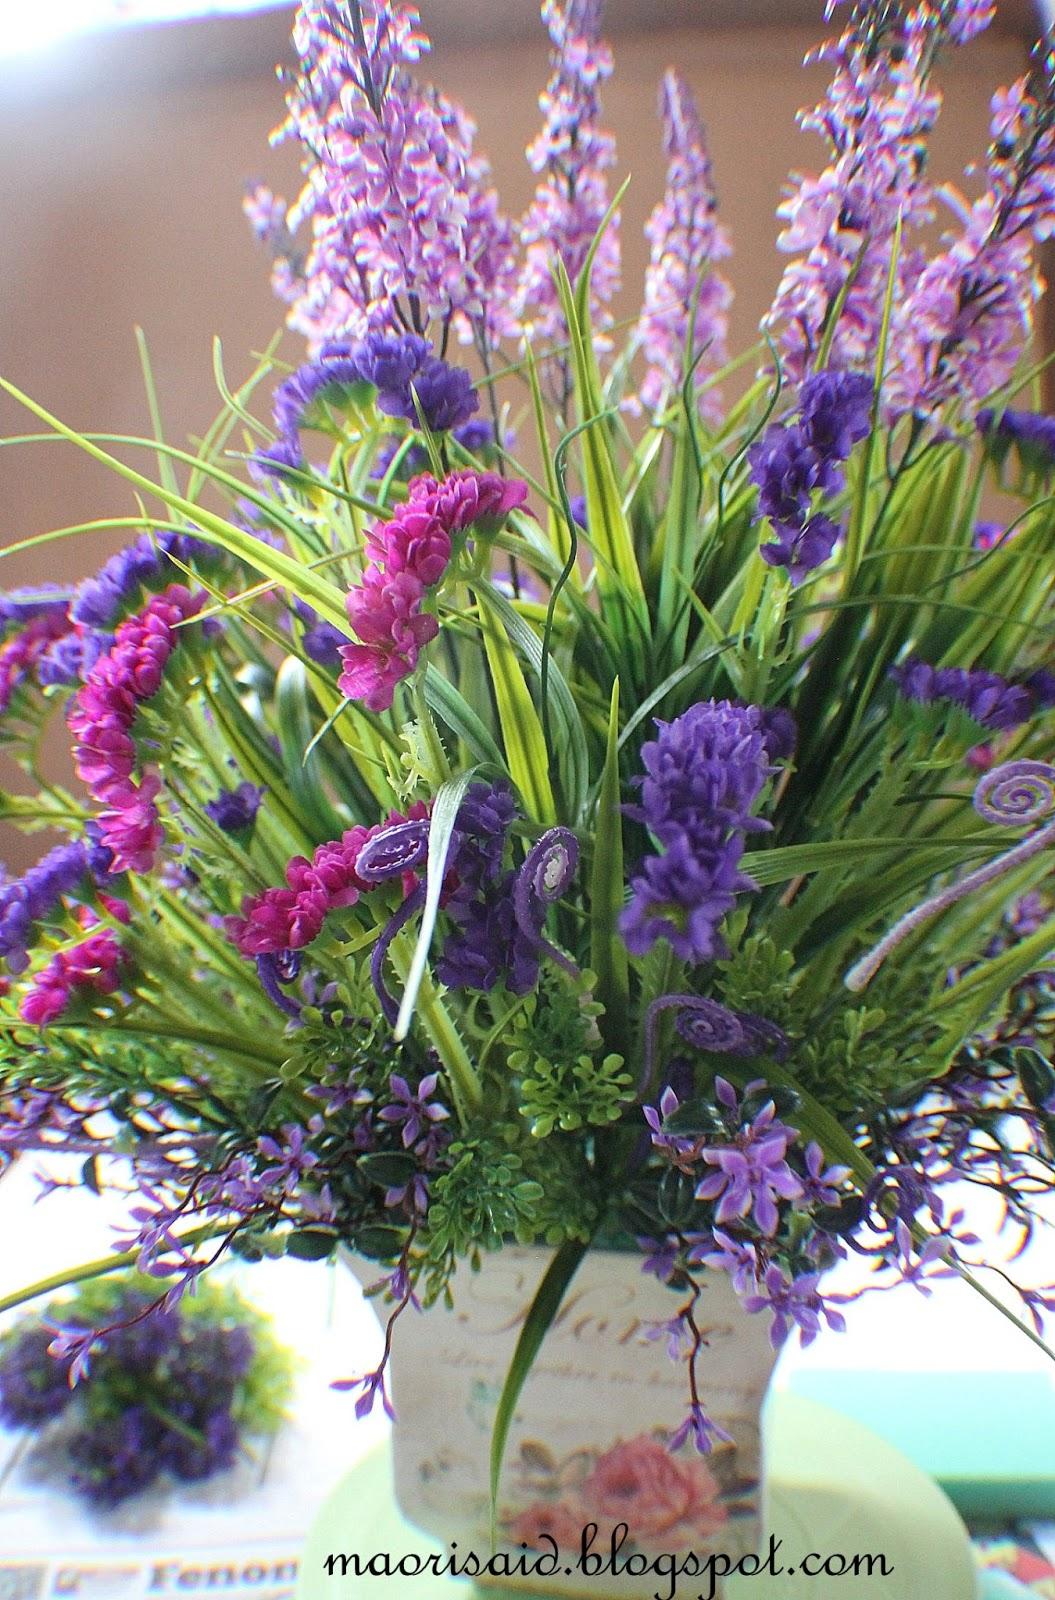 Tambah Kan Lagi Bunga Accessories Di Bahagian Tepi